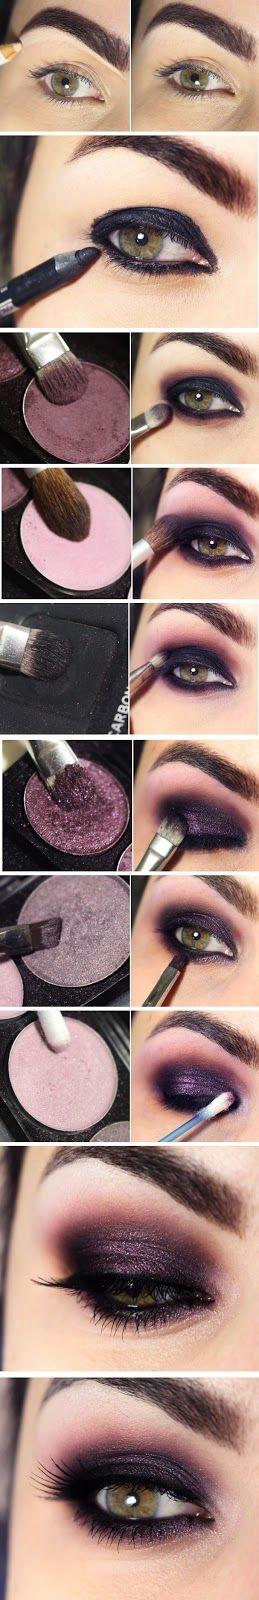 40 Hottest Smokey Eye Makeup Ideas 2019 Smokey Eye Tutorials For